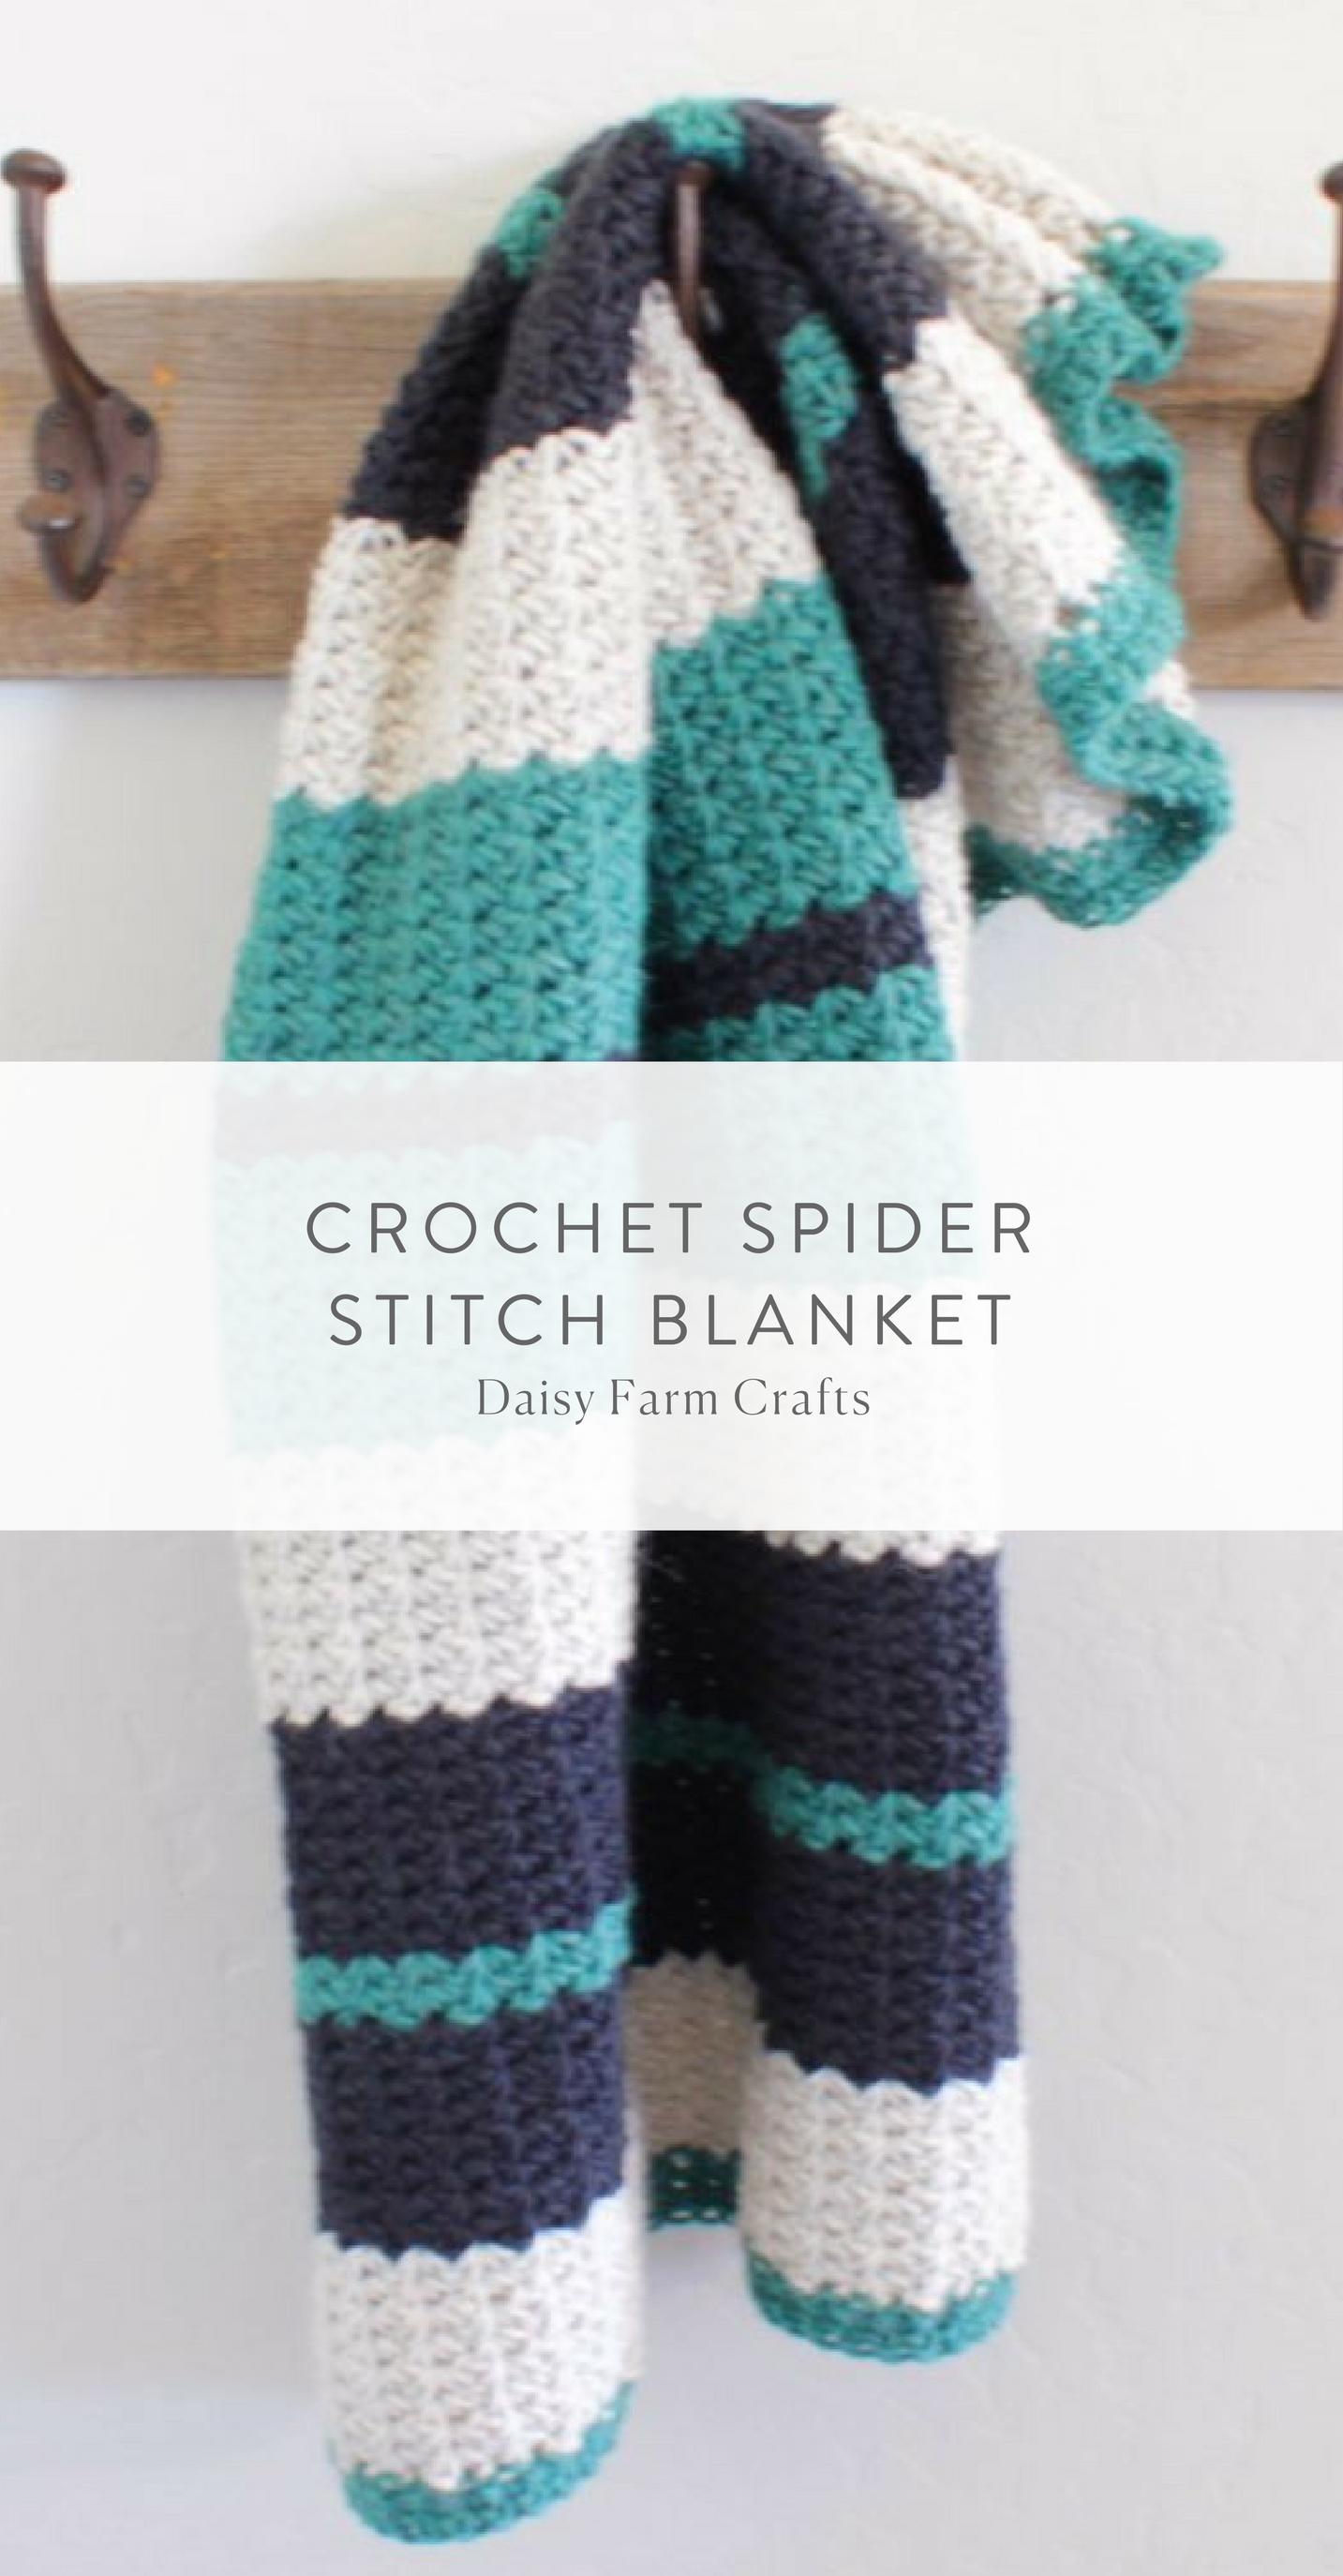 Crochet Spider Stitch Blanket   things to make   Pinterest   Manta y ...